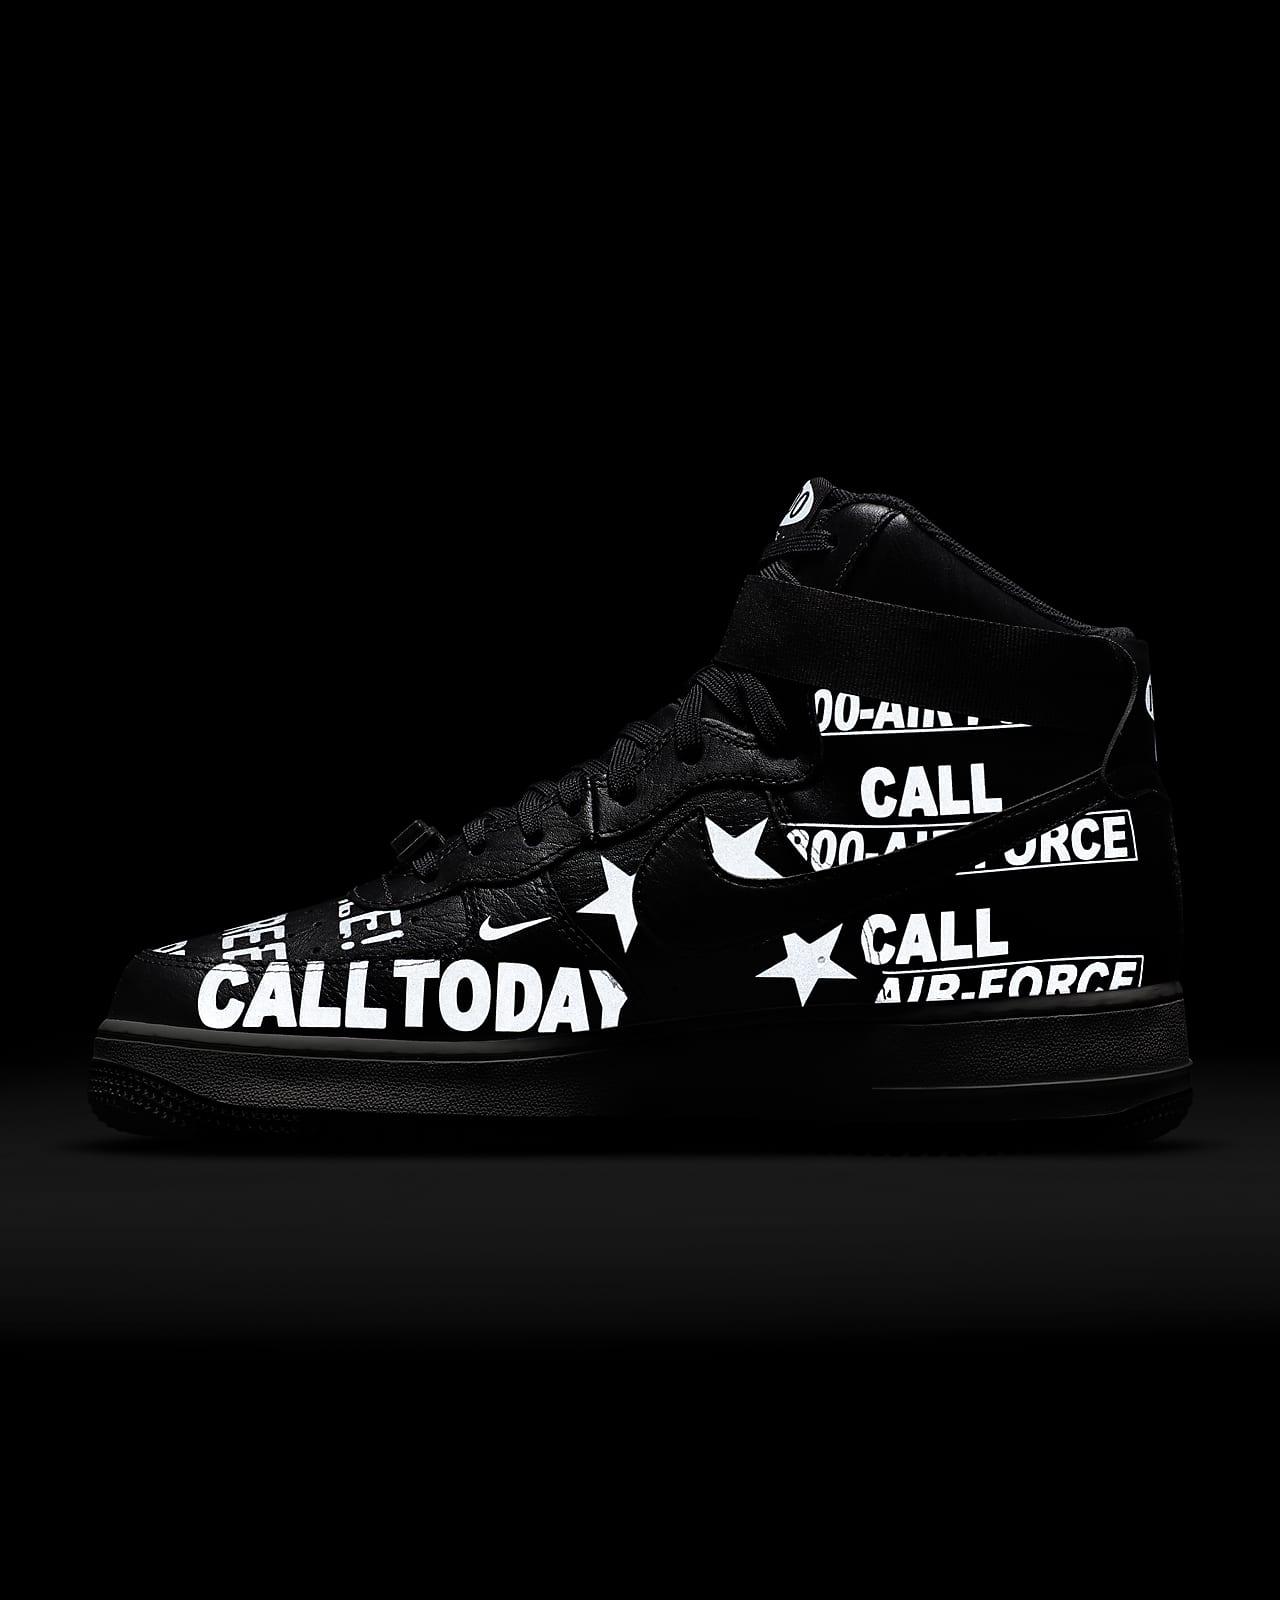 Chaussure Nike Air Force 1 High '07 Premium pour Homme